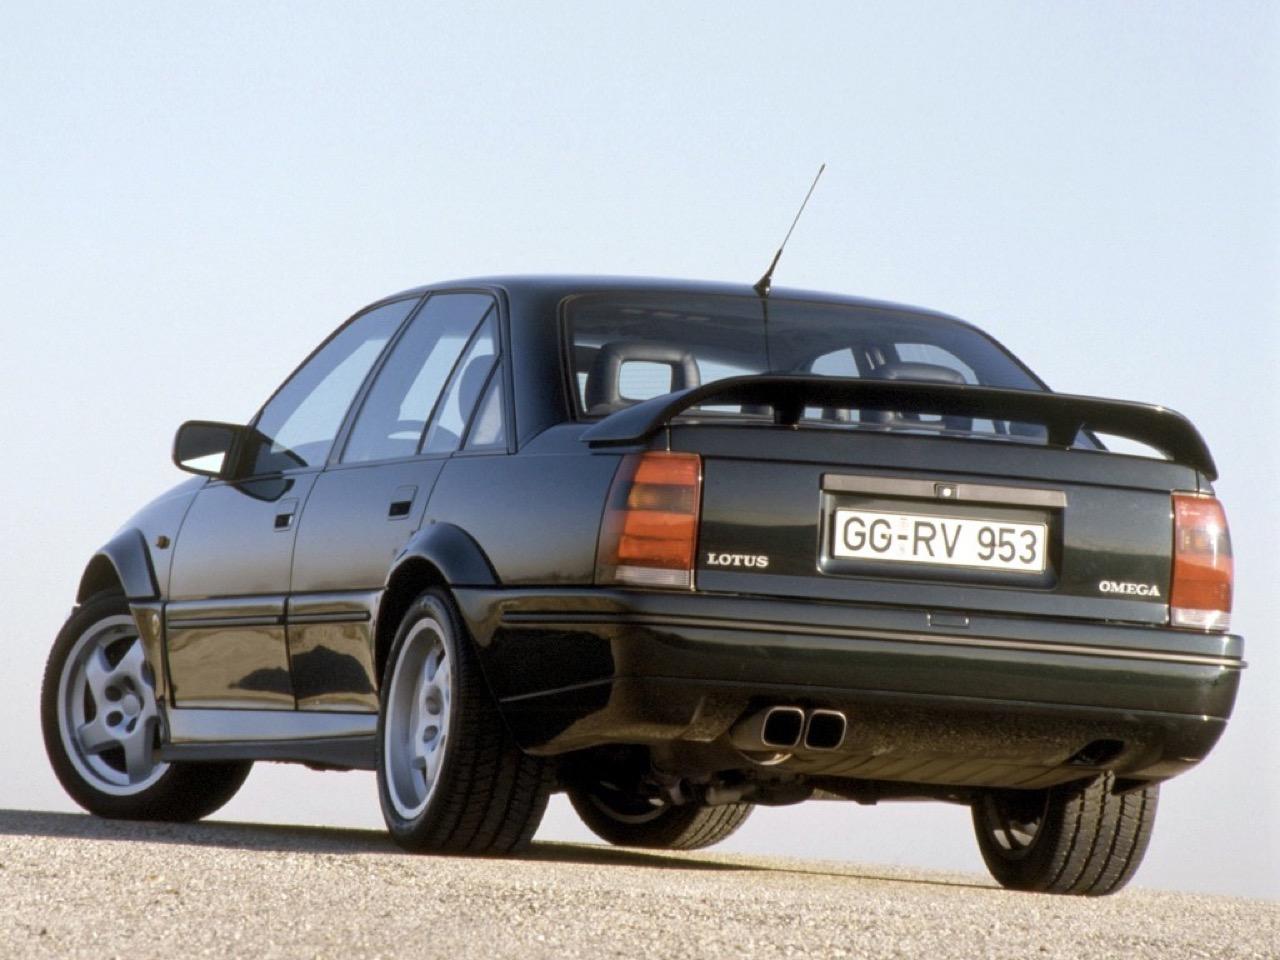 Opel Omega Lotus - Le monstre des 90's ! 41